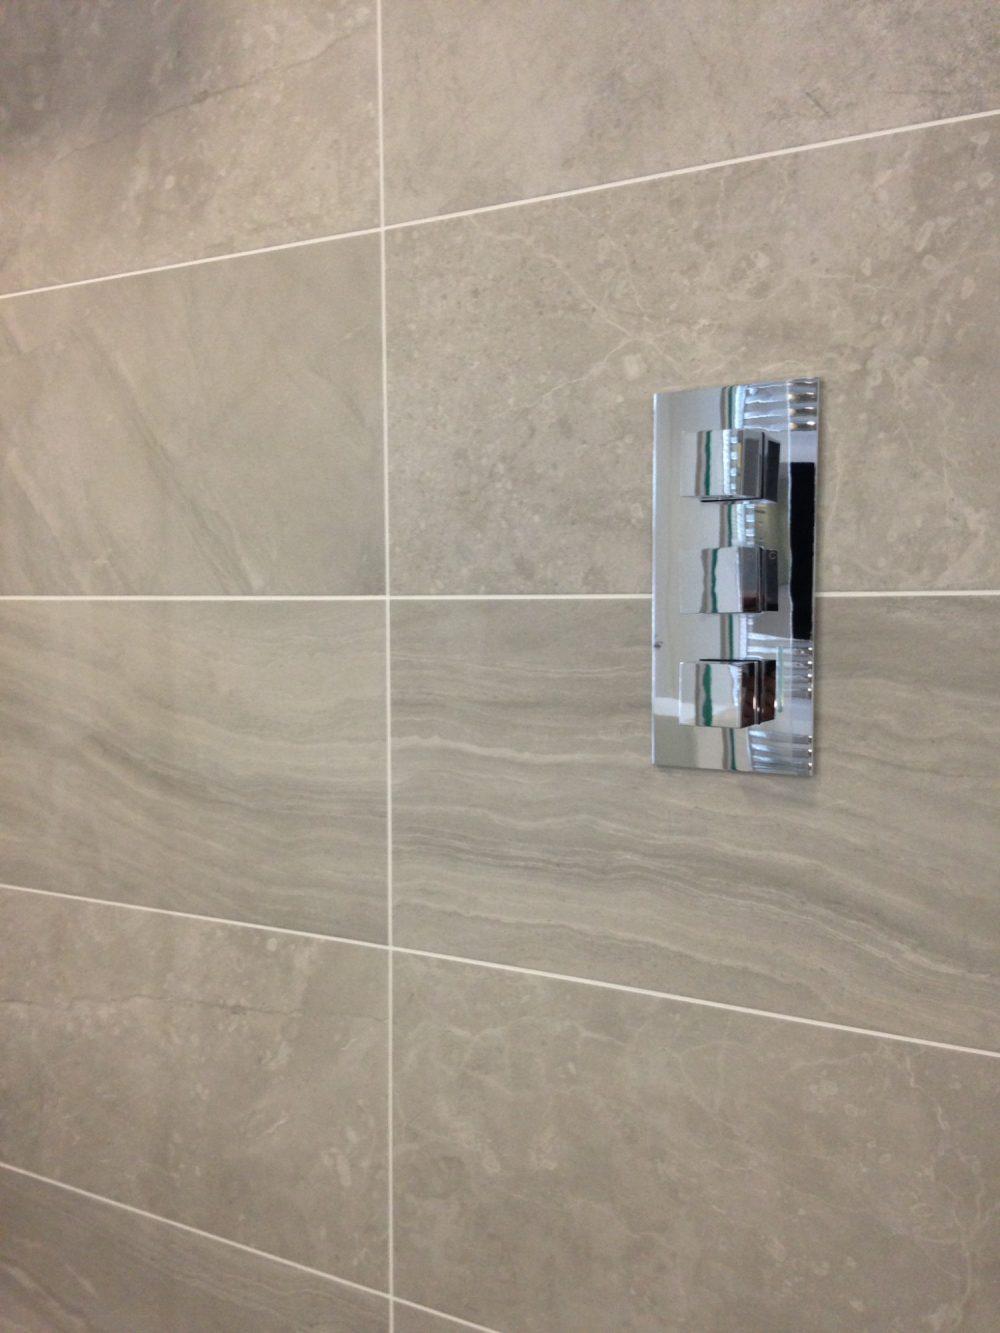 Blast wall tiles